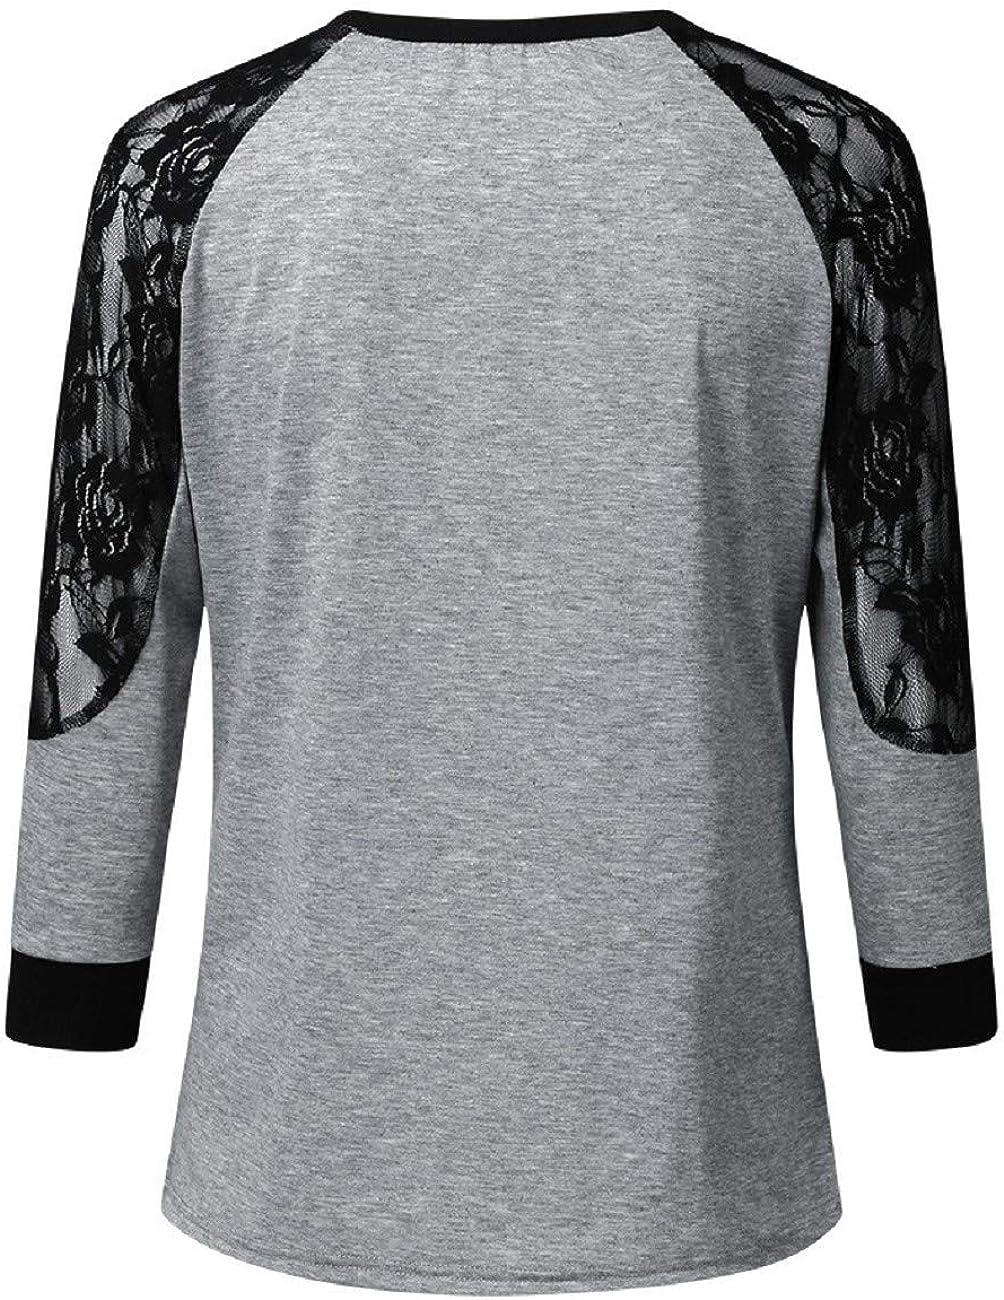 FAPIZI Women Fashion Lace Floral Splicing Long Sleeve Sweater Coat O Neck T Shirt Blouse Tops